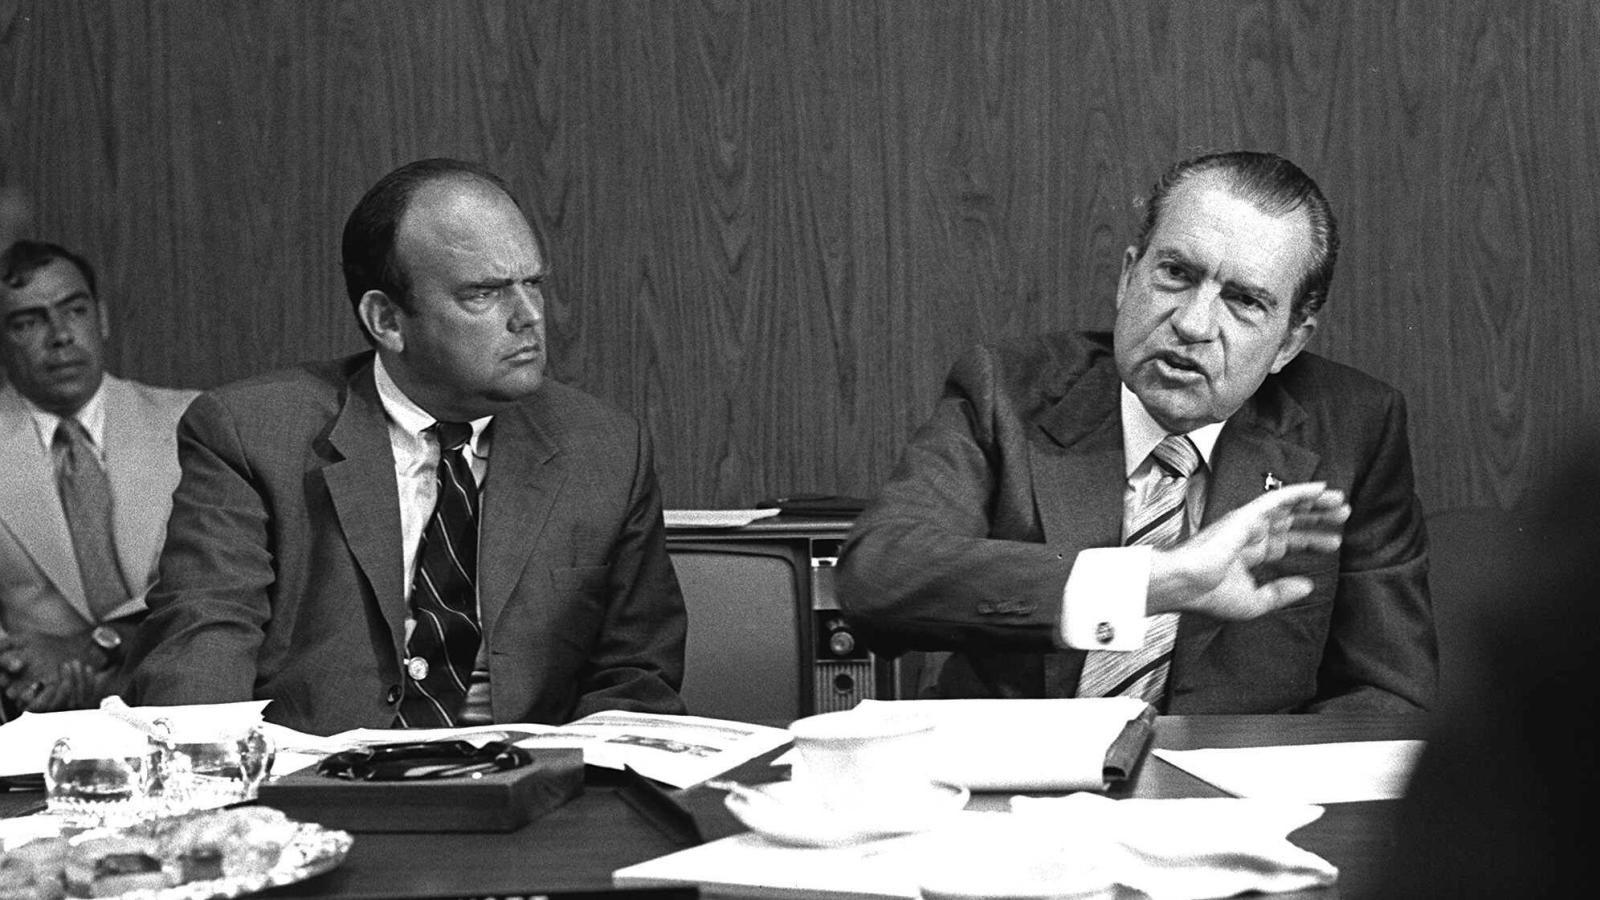 Richard Nixon pictured with John Ehrlichman